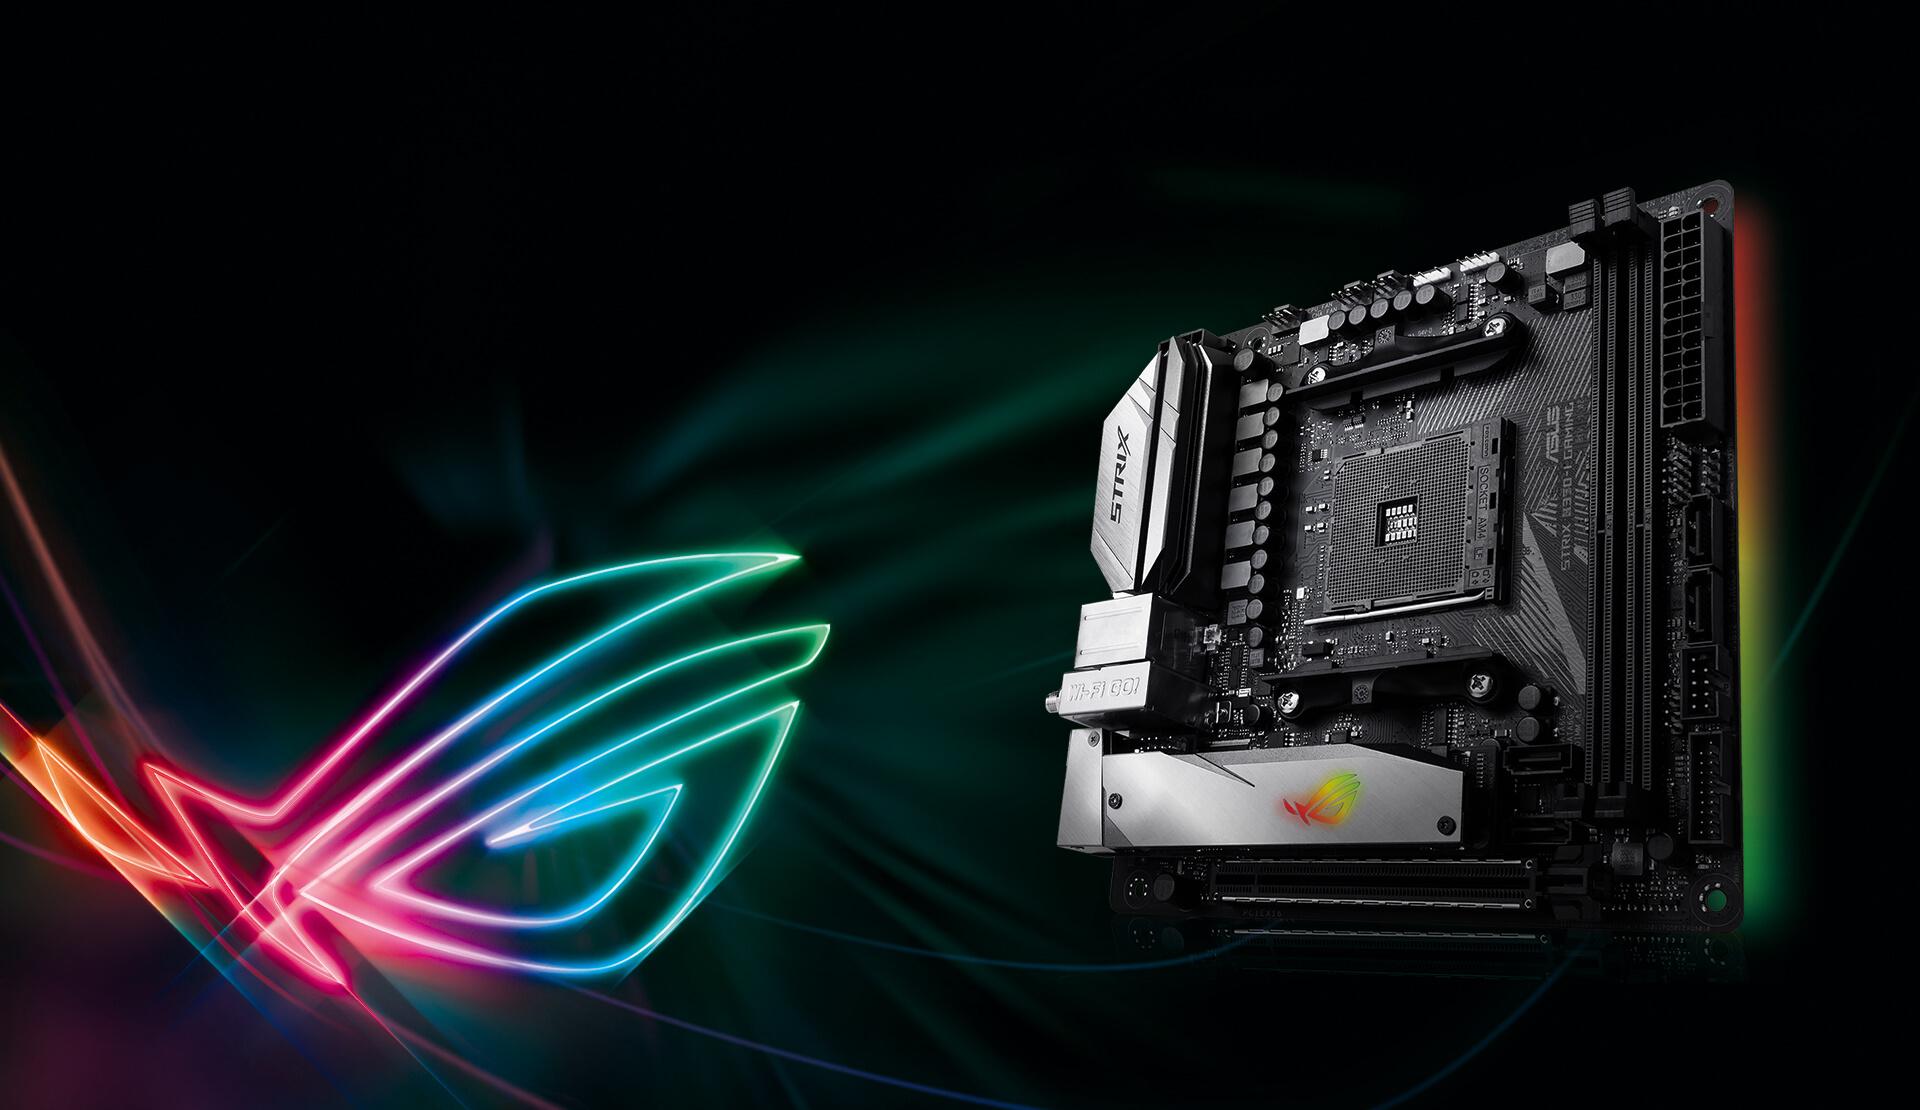 ROG STRIX B350-I GAMING | Motherboards | ASUS USA